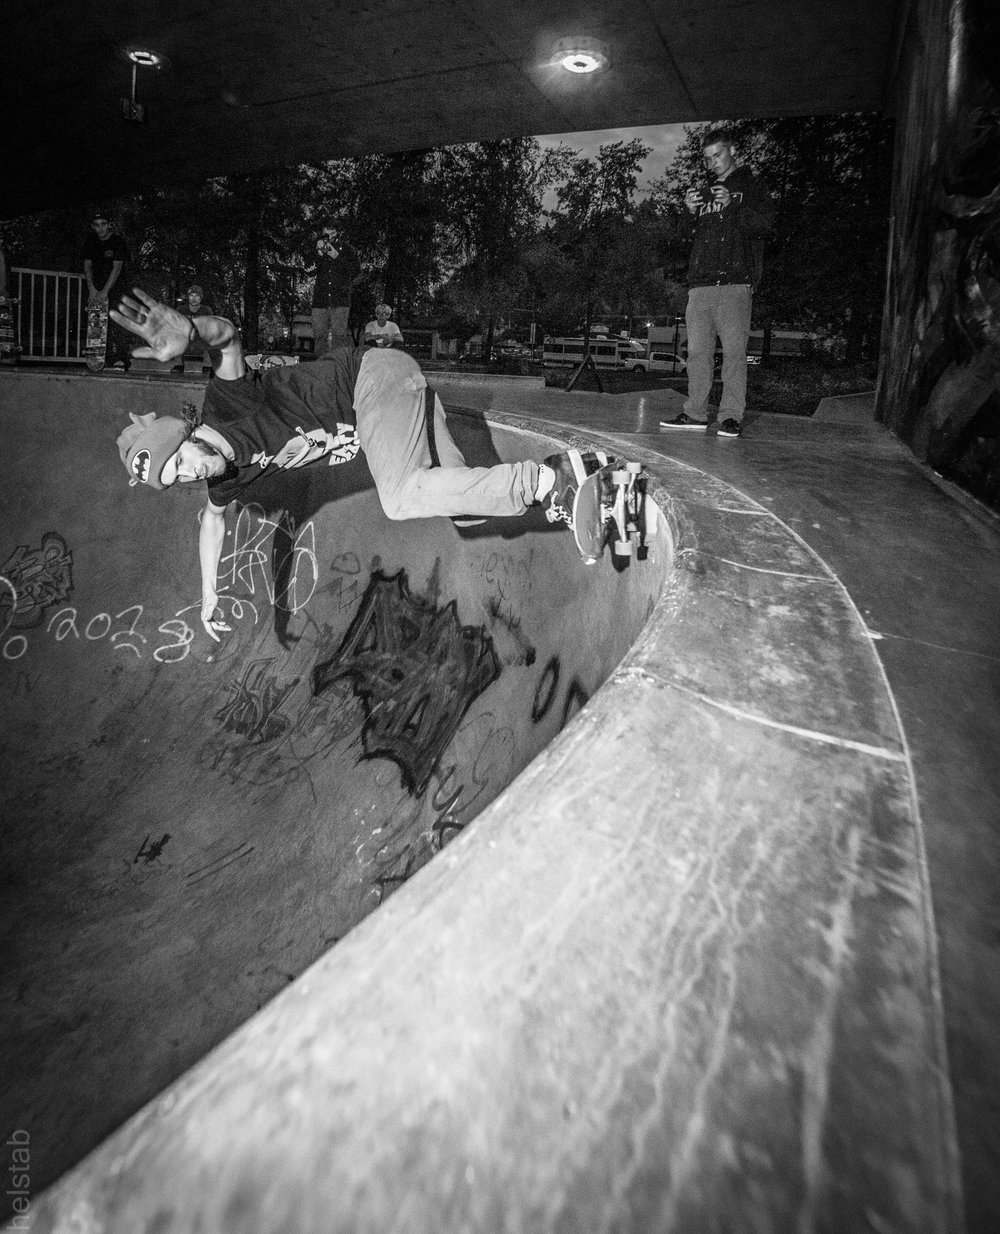 Caleb Sollars - Bs 5-0 - Photo. Matt Helstab